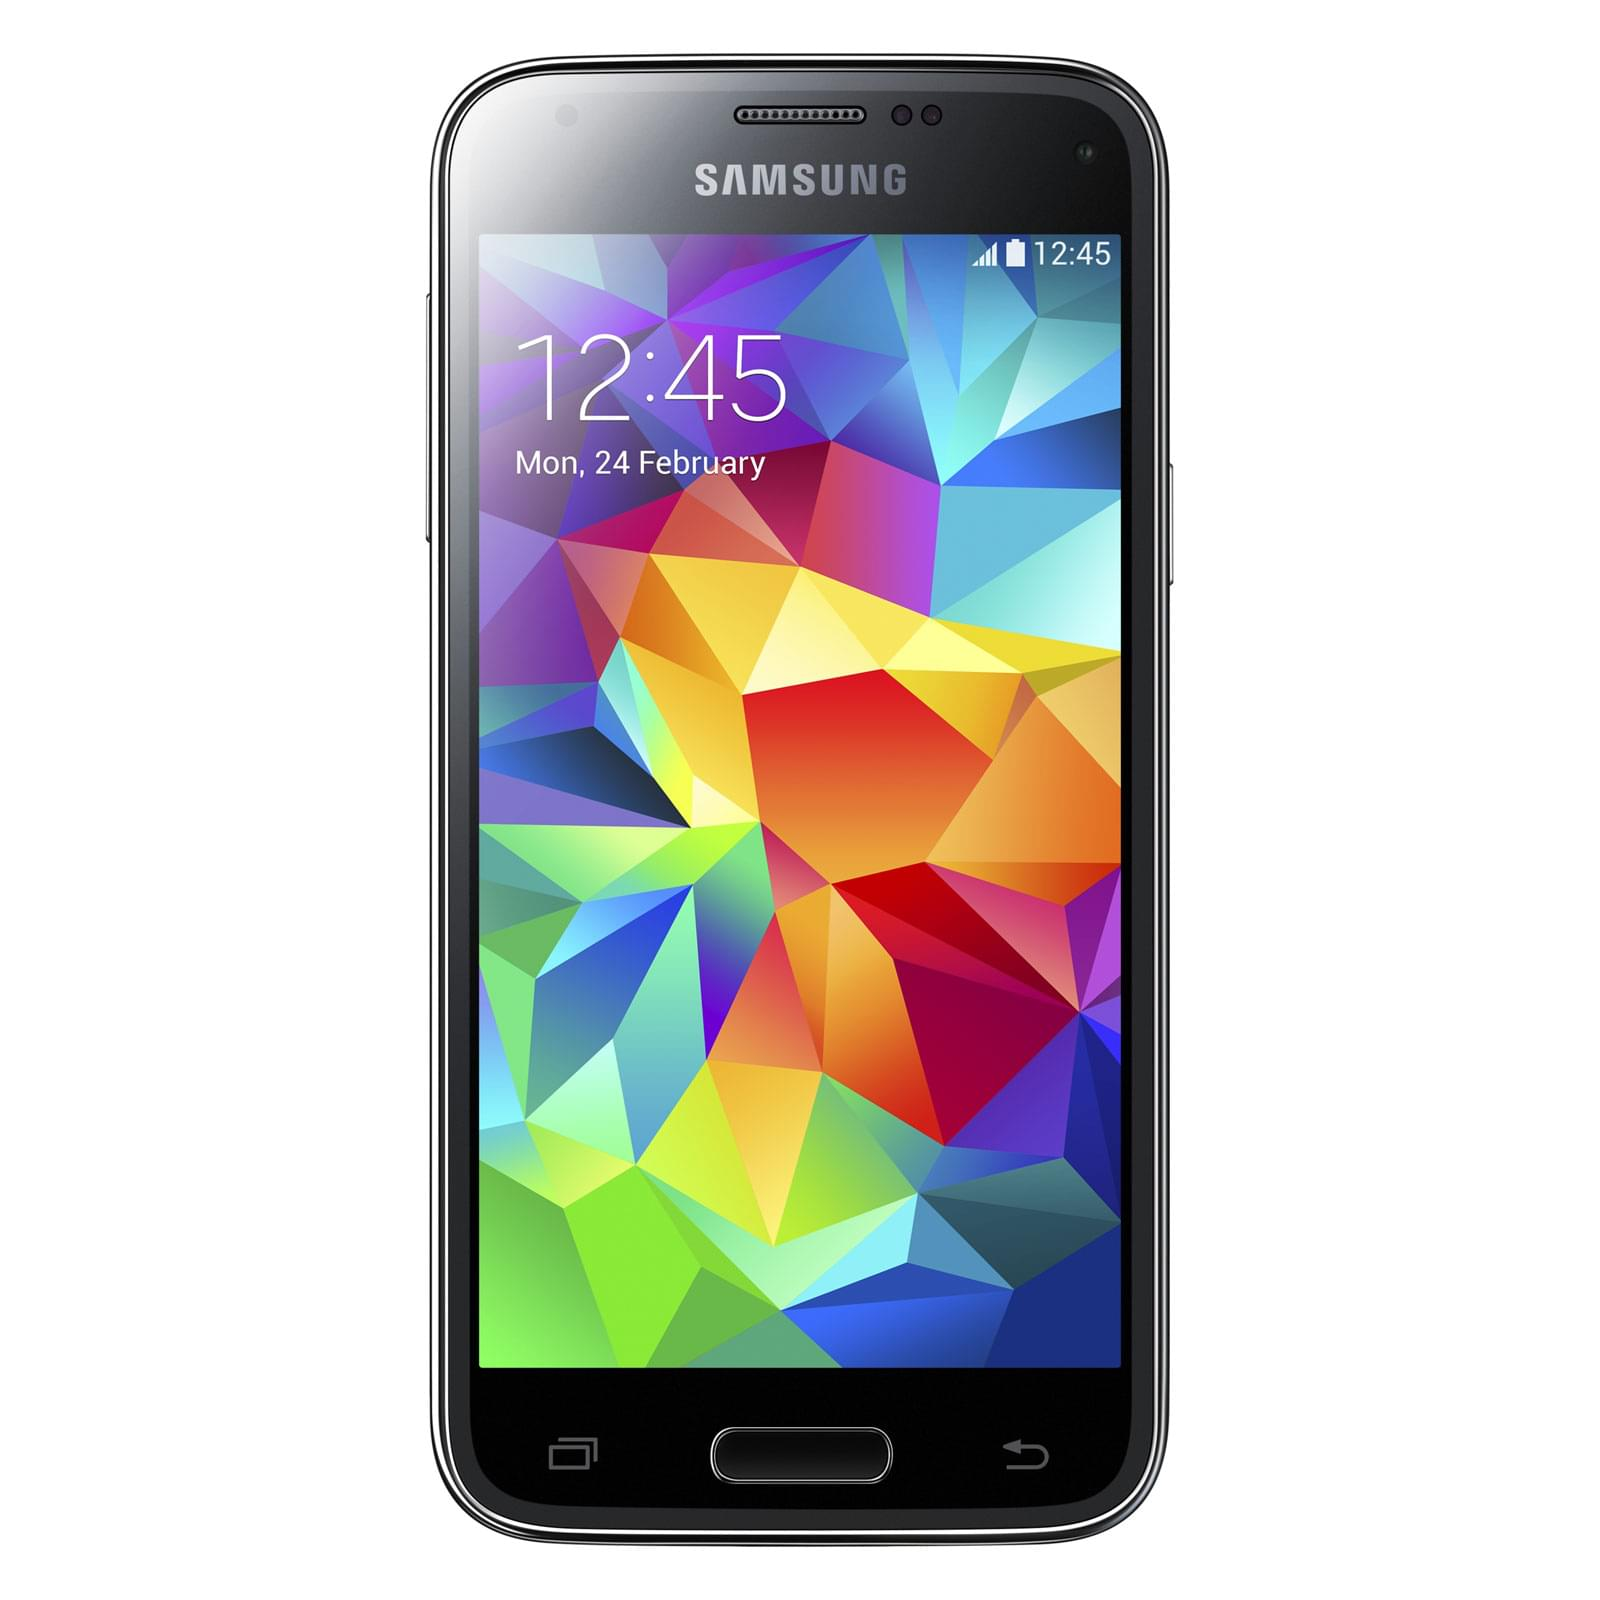 Samsung Galaxy S5 Mini G800 Black (SM-G800FZKAXEF) - Achat / Vente Téléphonie sur Cybertek.fr - 0